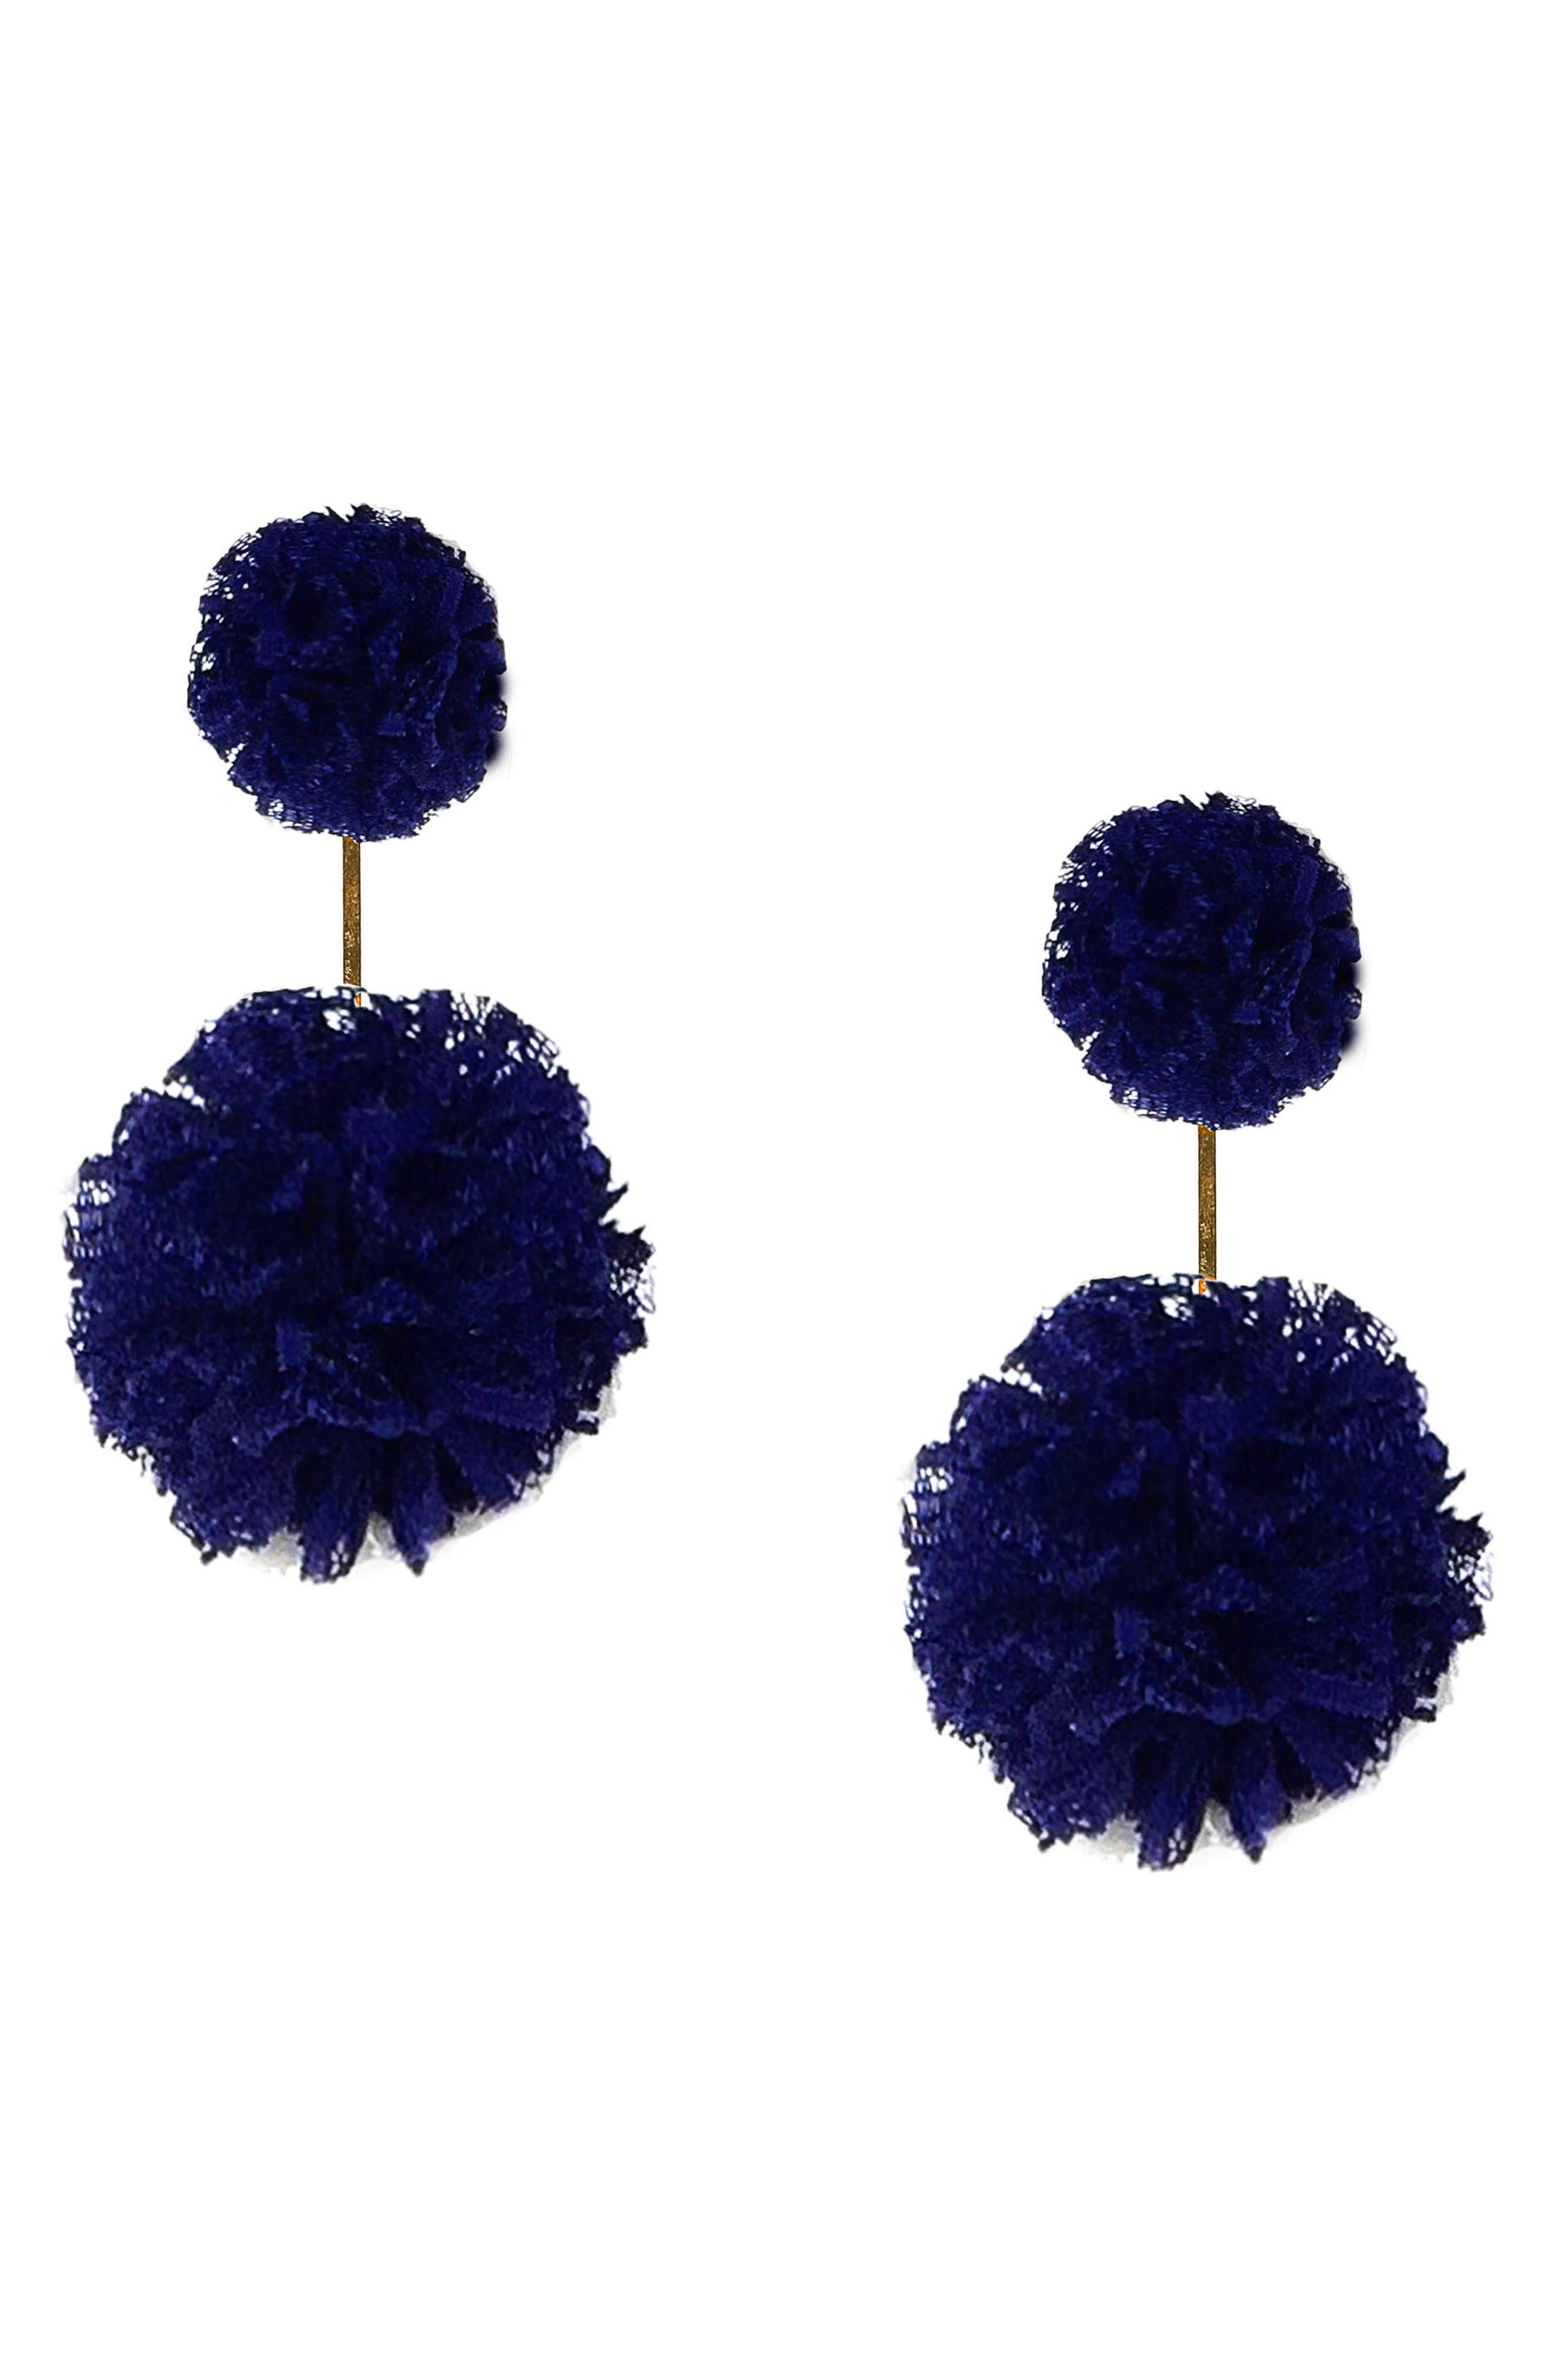 Double Lace Pom Pom Earrings,                         Main,                         color, Gold/ Cobalt Blue